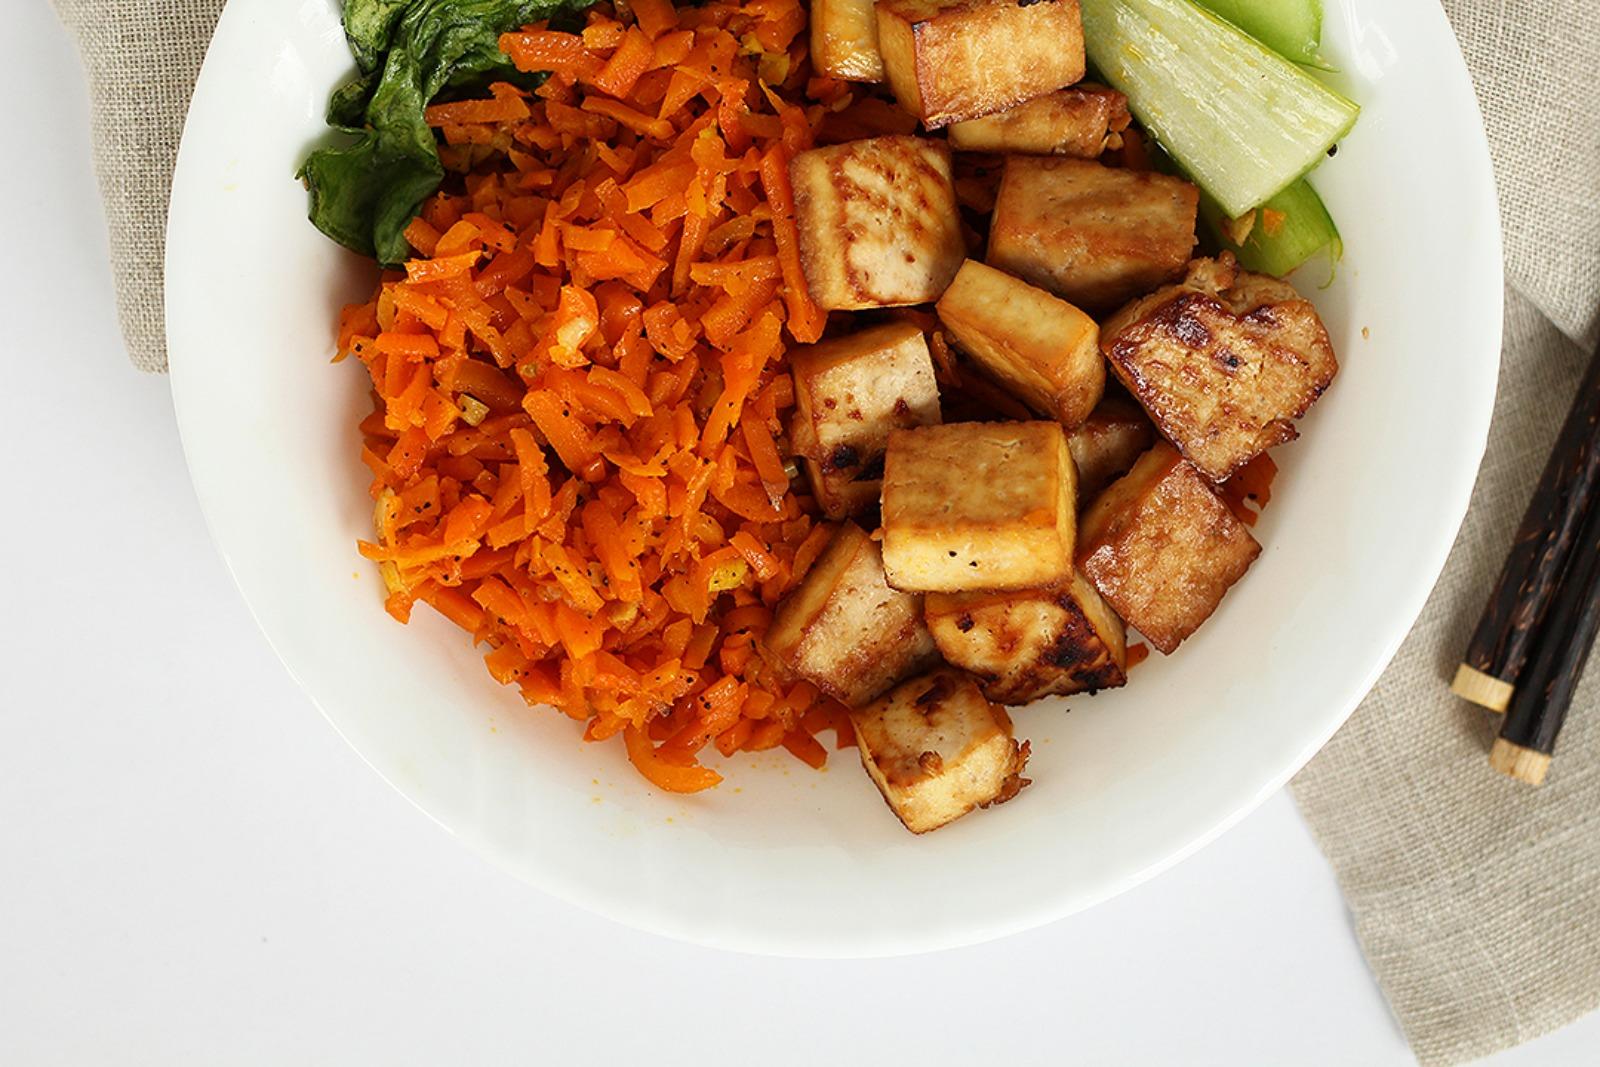 Asian ginger tofu